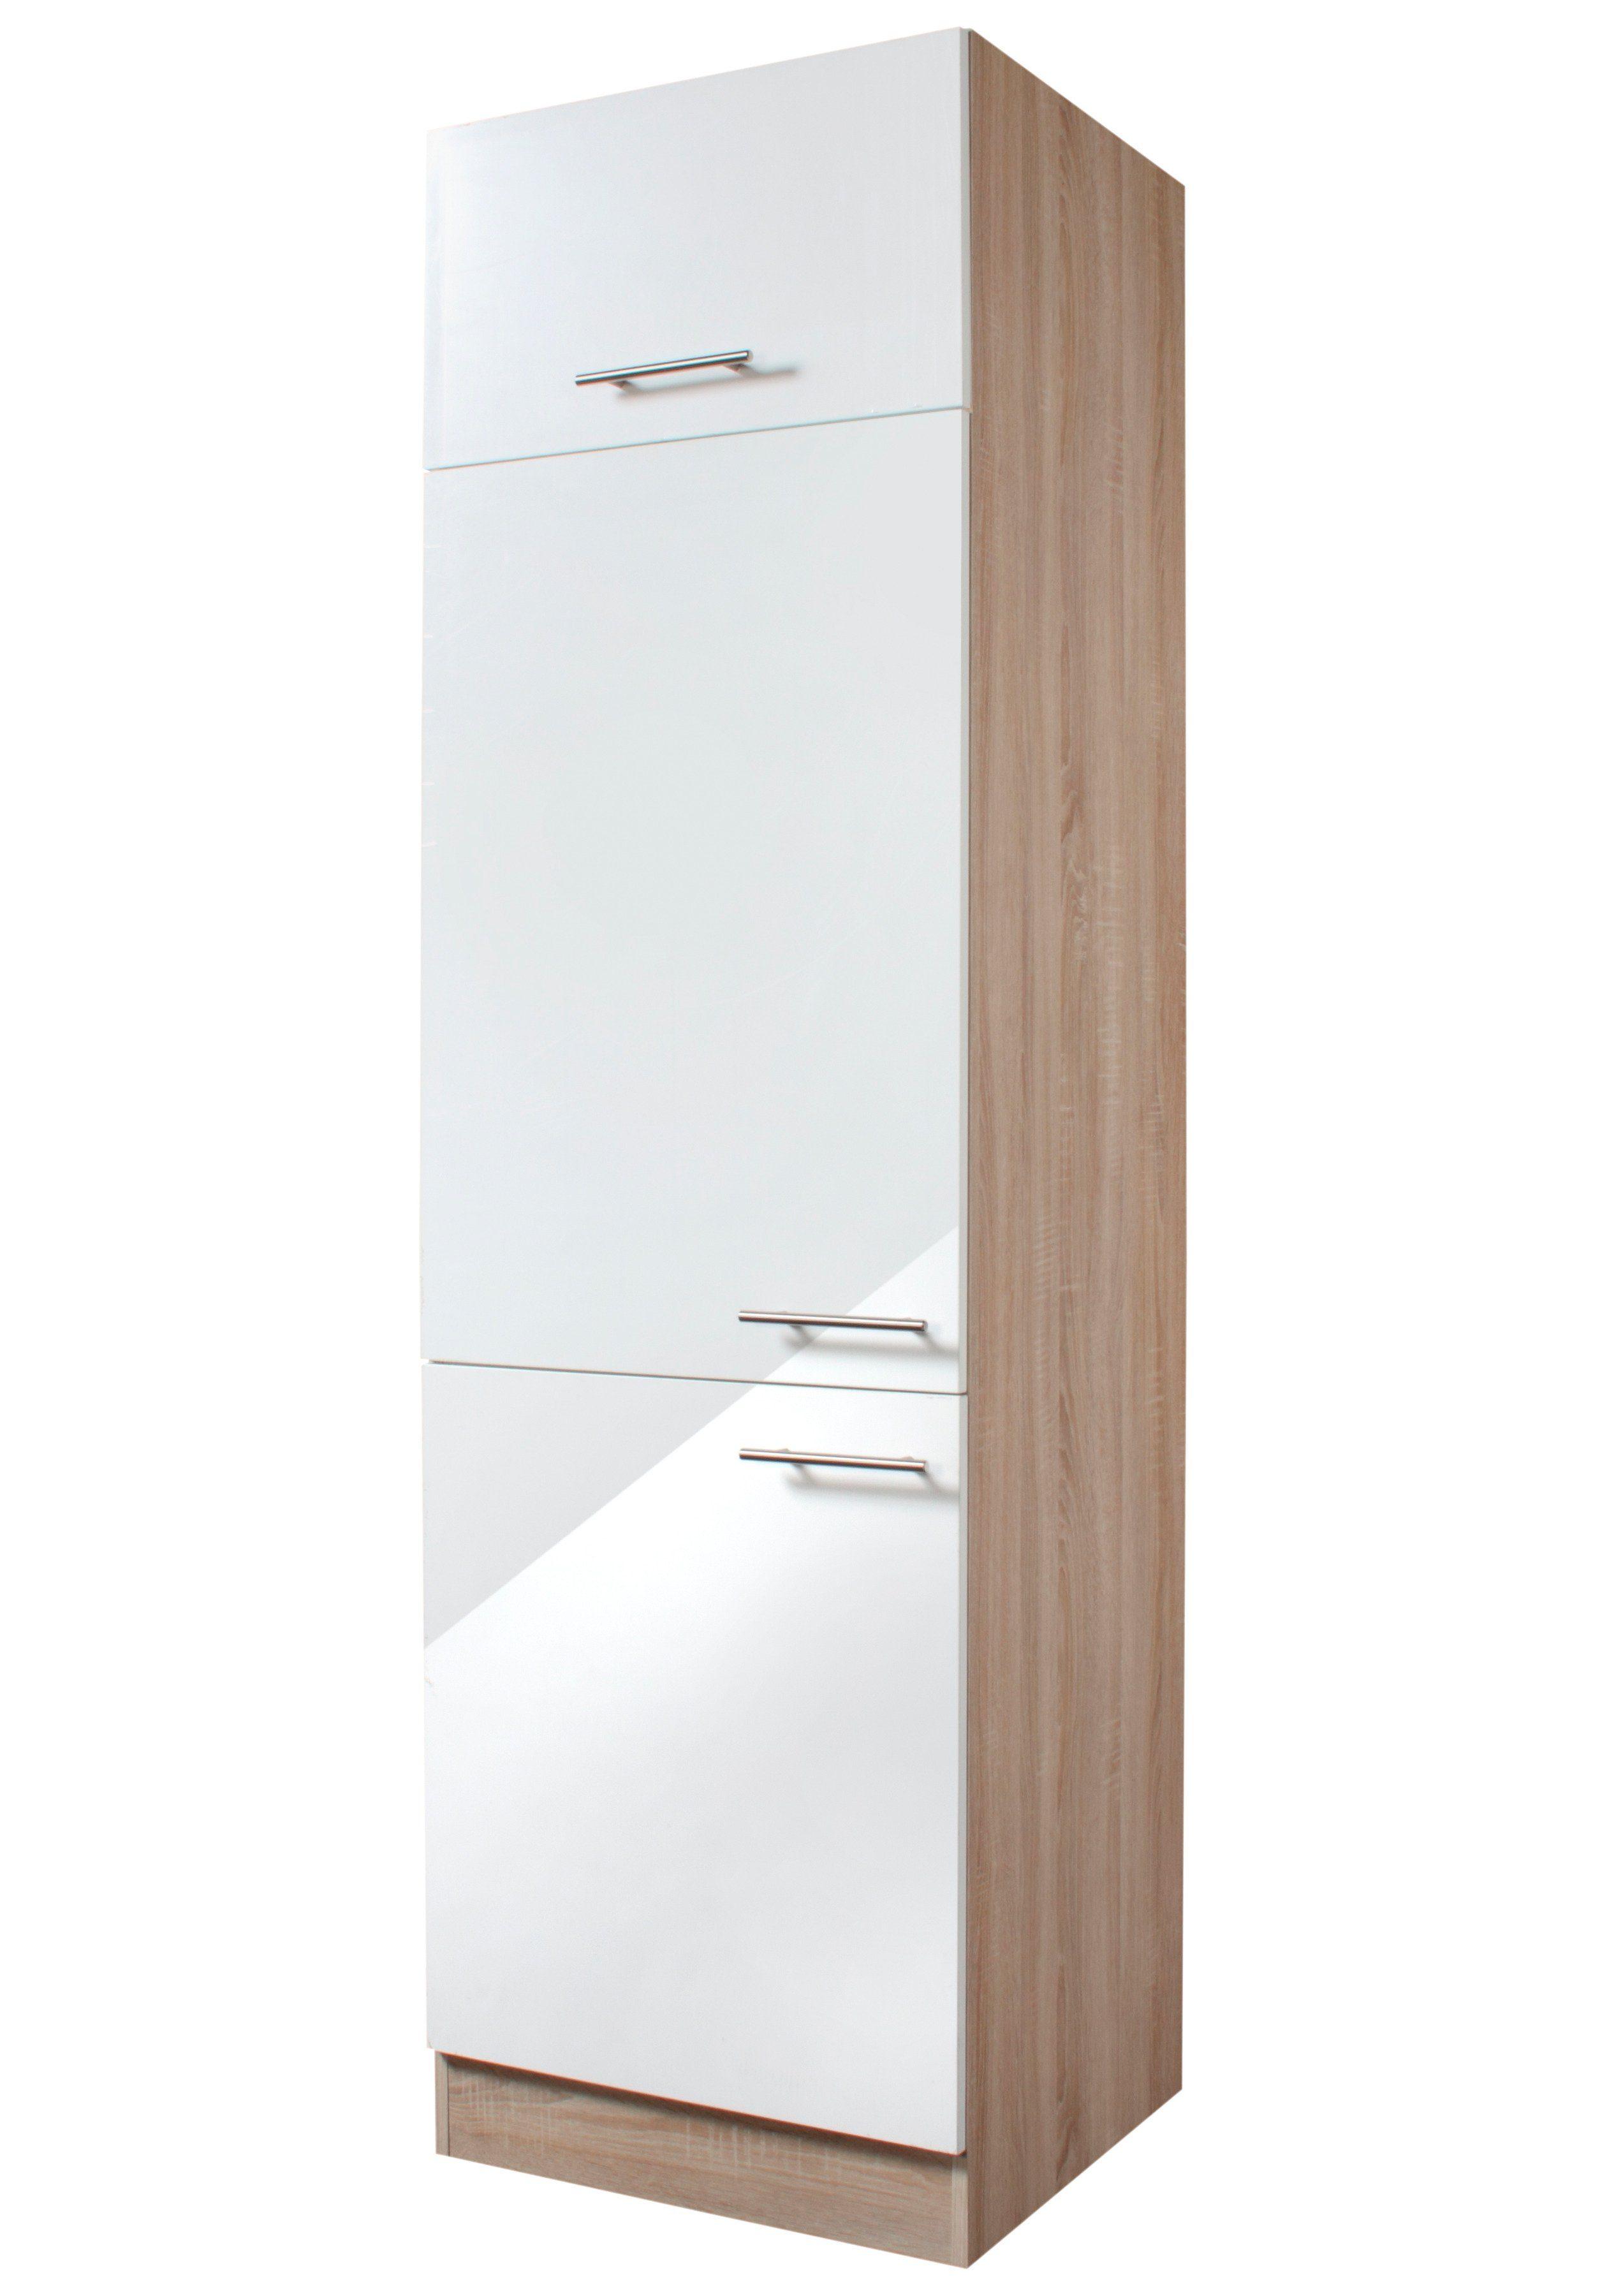 OPTIFIT Kühlumbauschrank »Dakar, Höhe 206,8 cm«